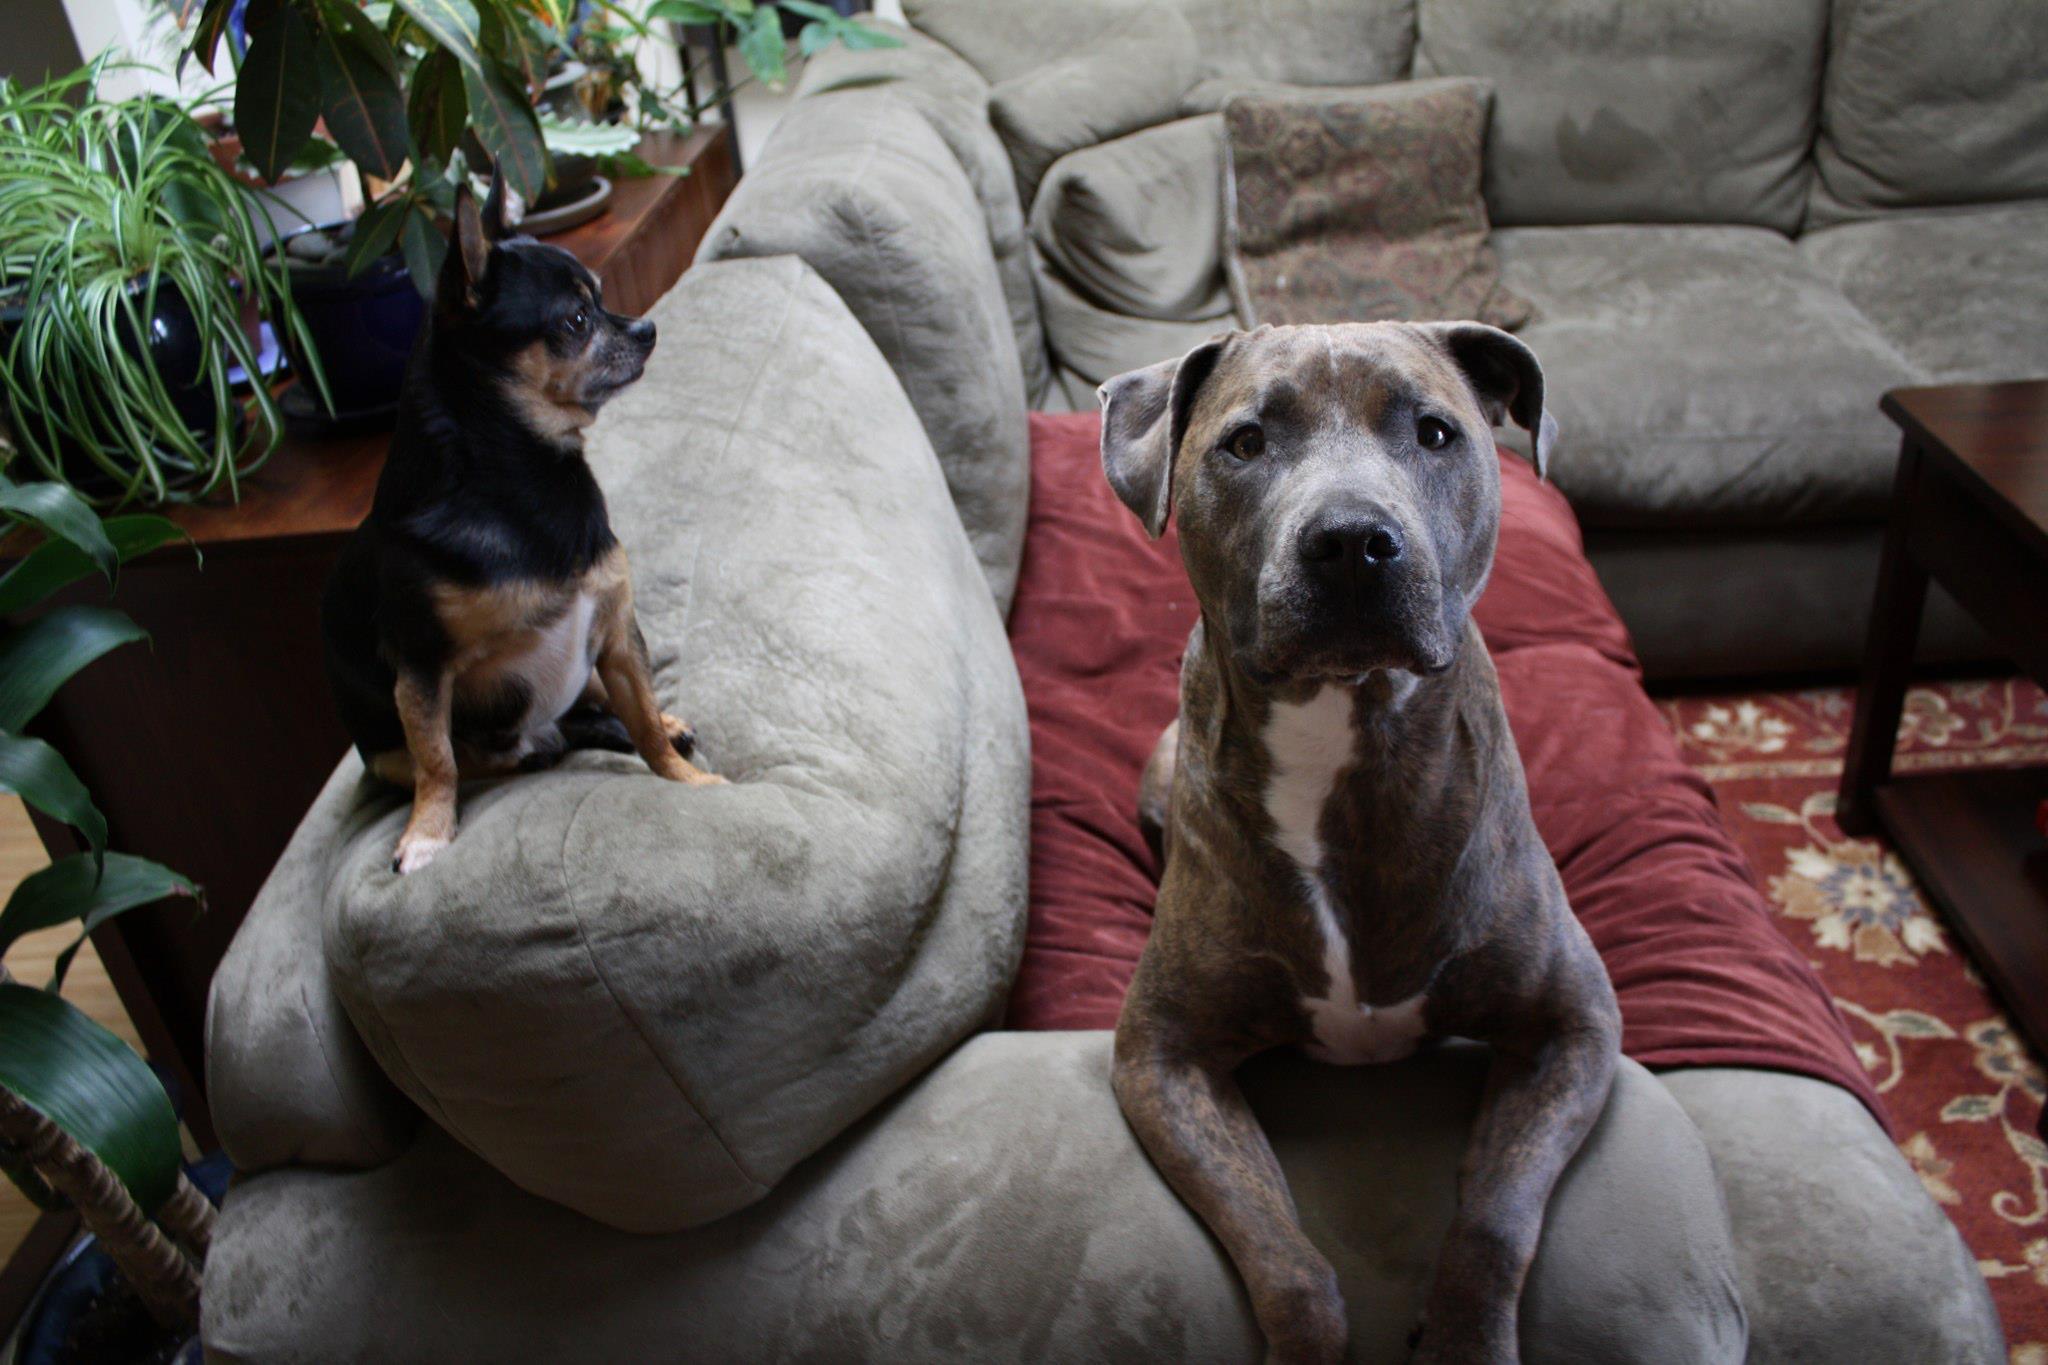 Kumu and Moke